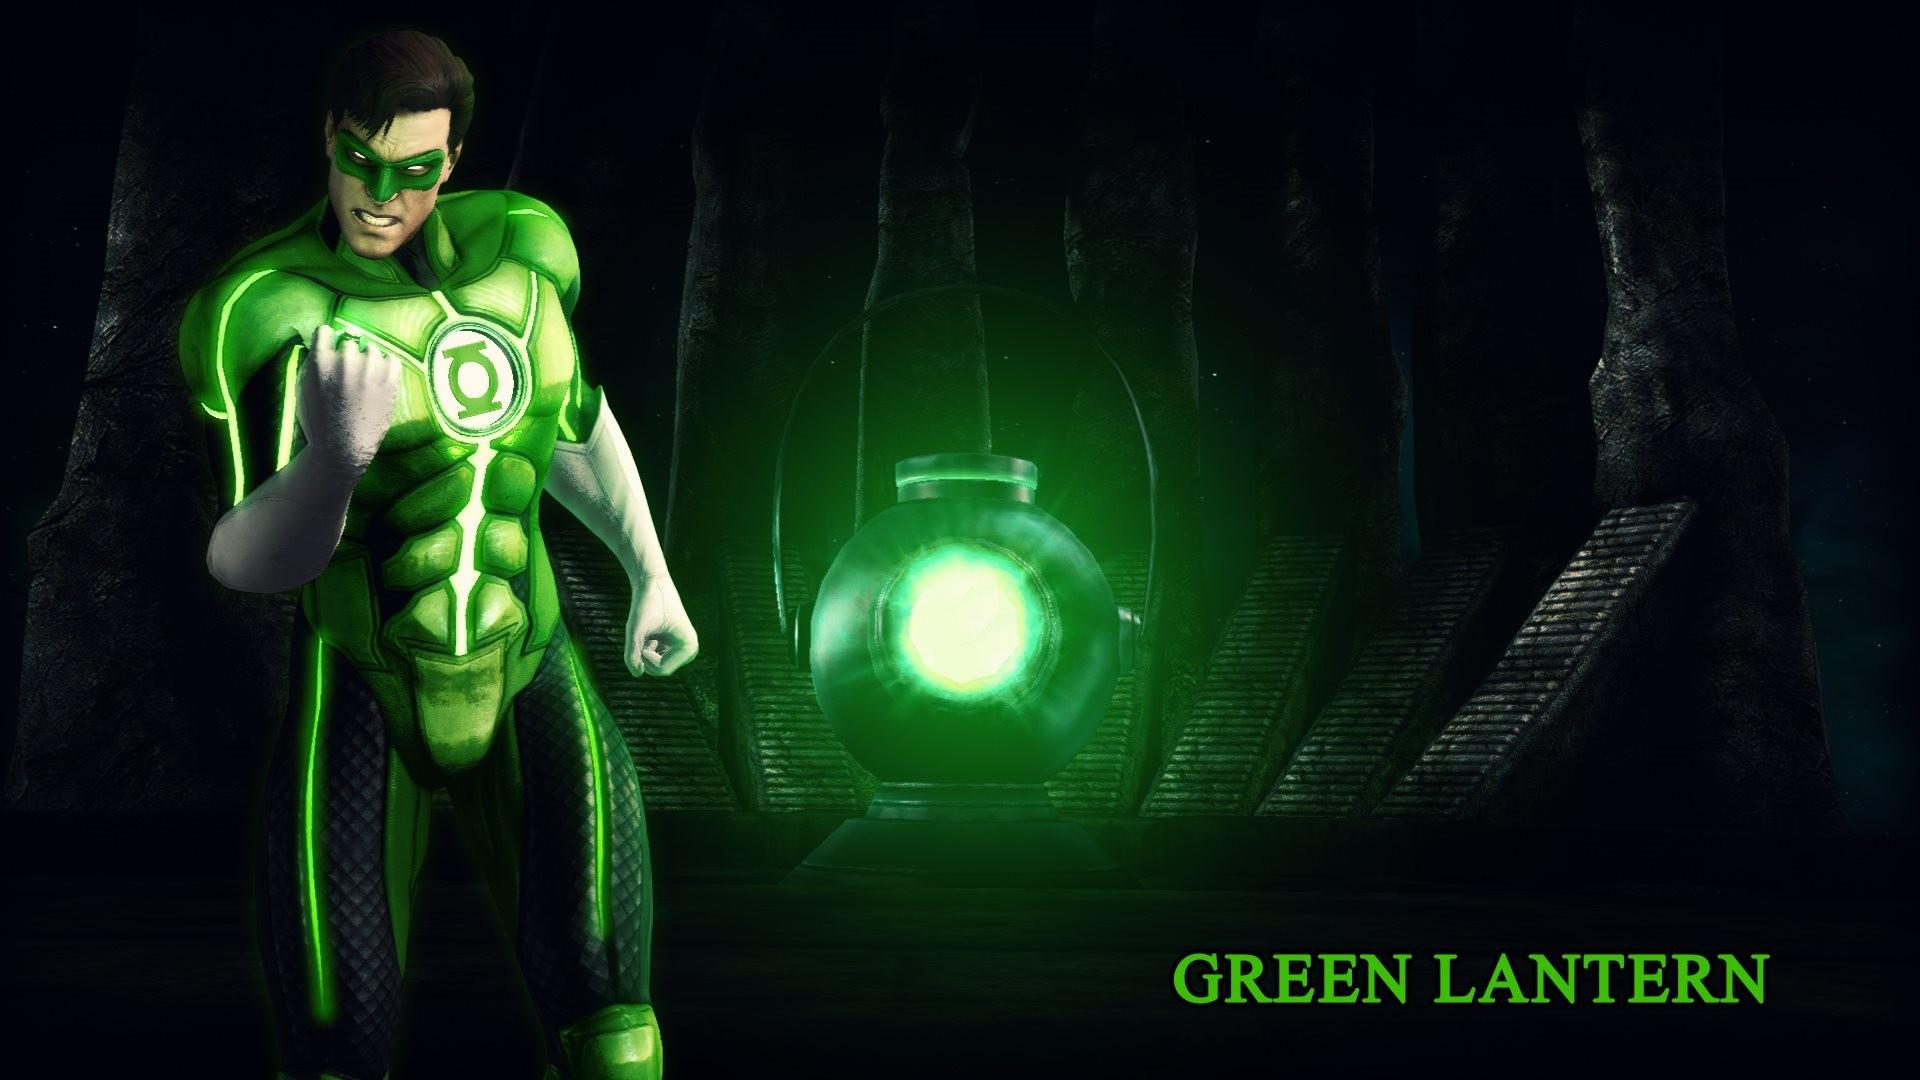 Amazing Green Lantern HD Wallpapers – SH.VM   Best Games Wallpapers    Pinterest   Wallpaper and Wallpaper backgrounds